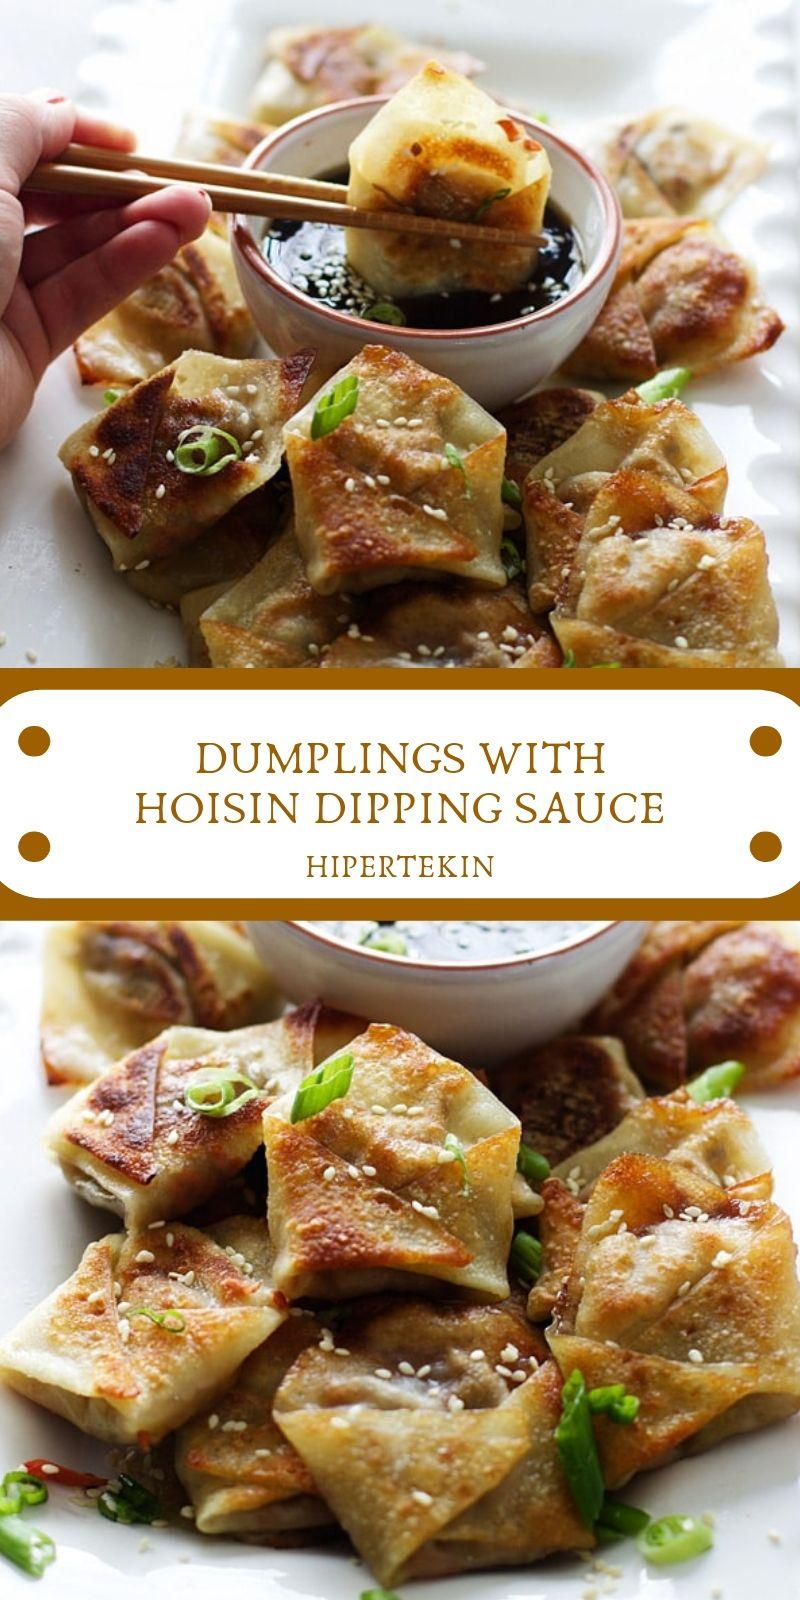 asian food #food #foods DUMPLINGS WITH HOISIN DIPPING SAUCE